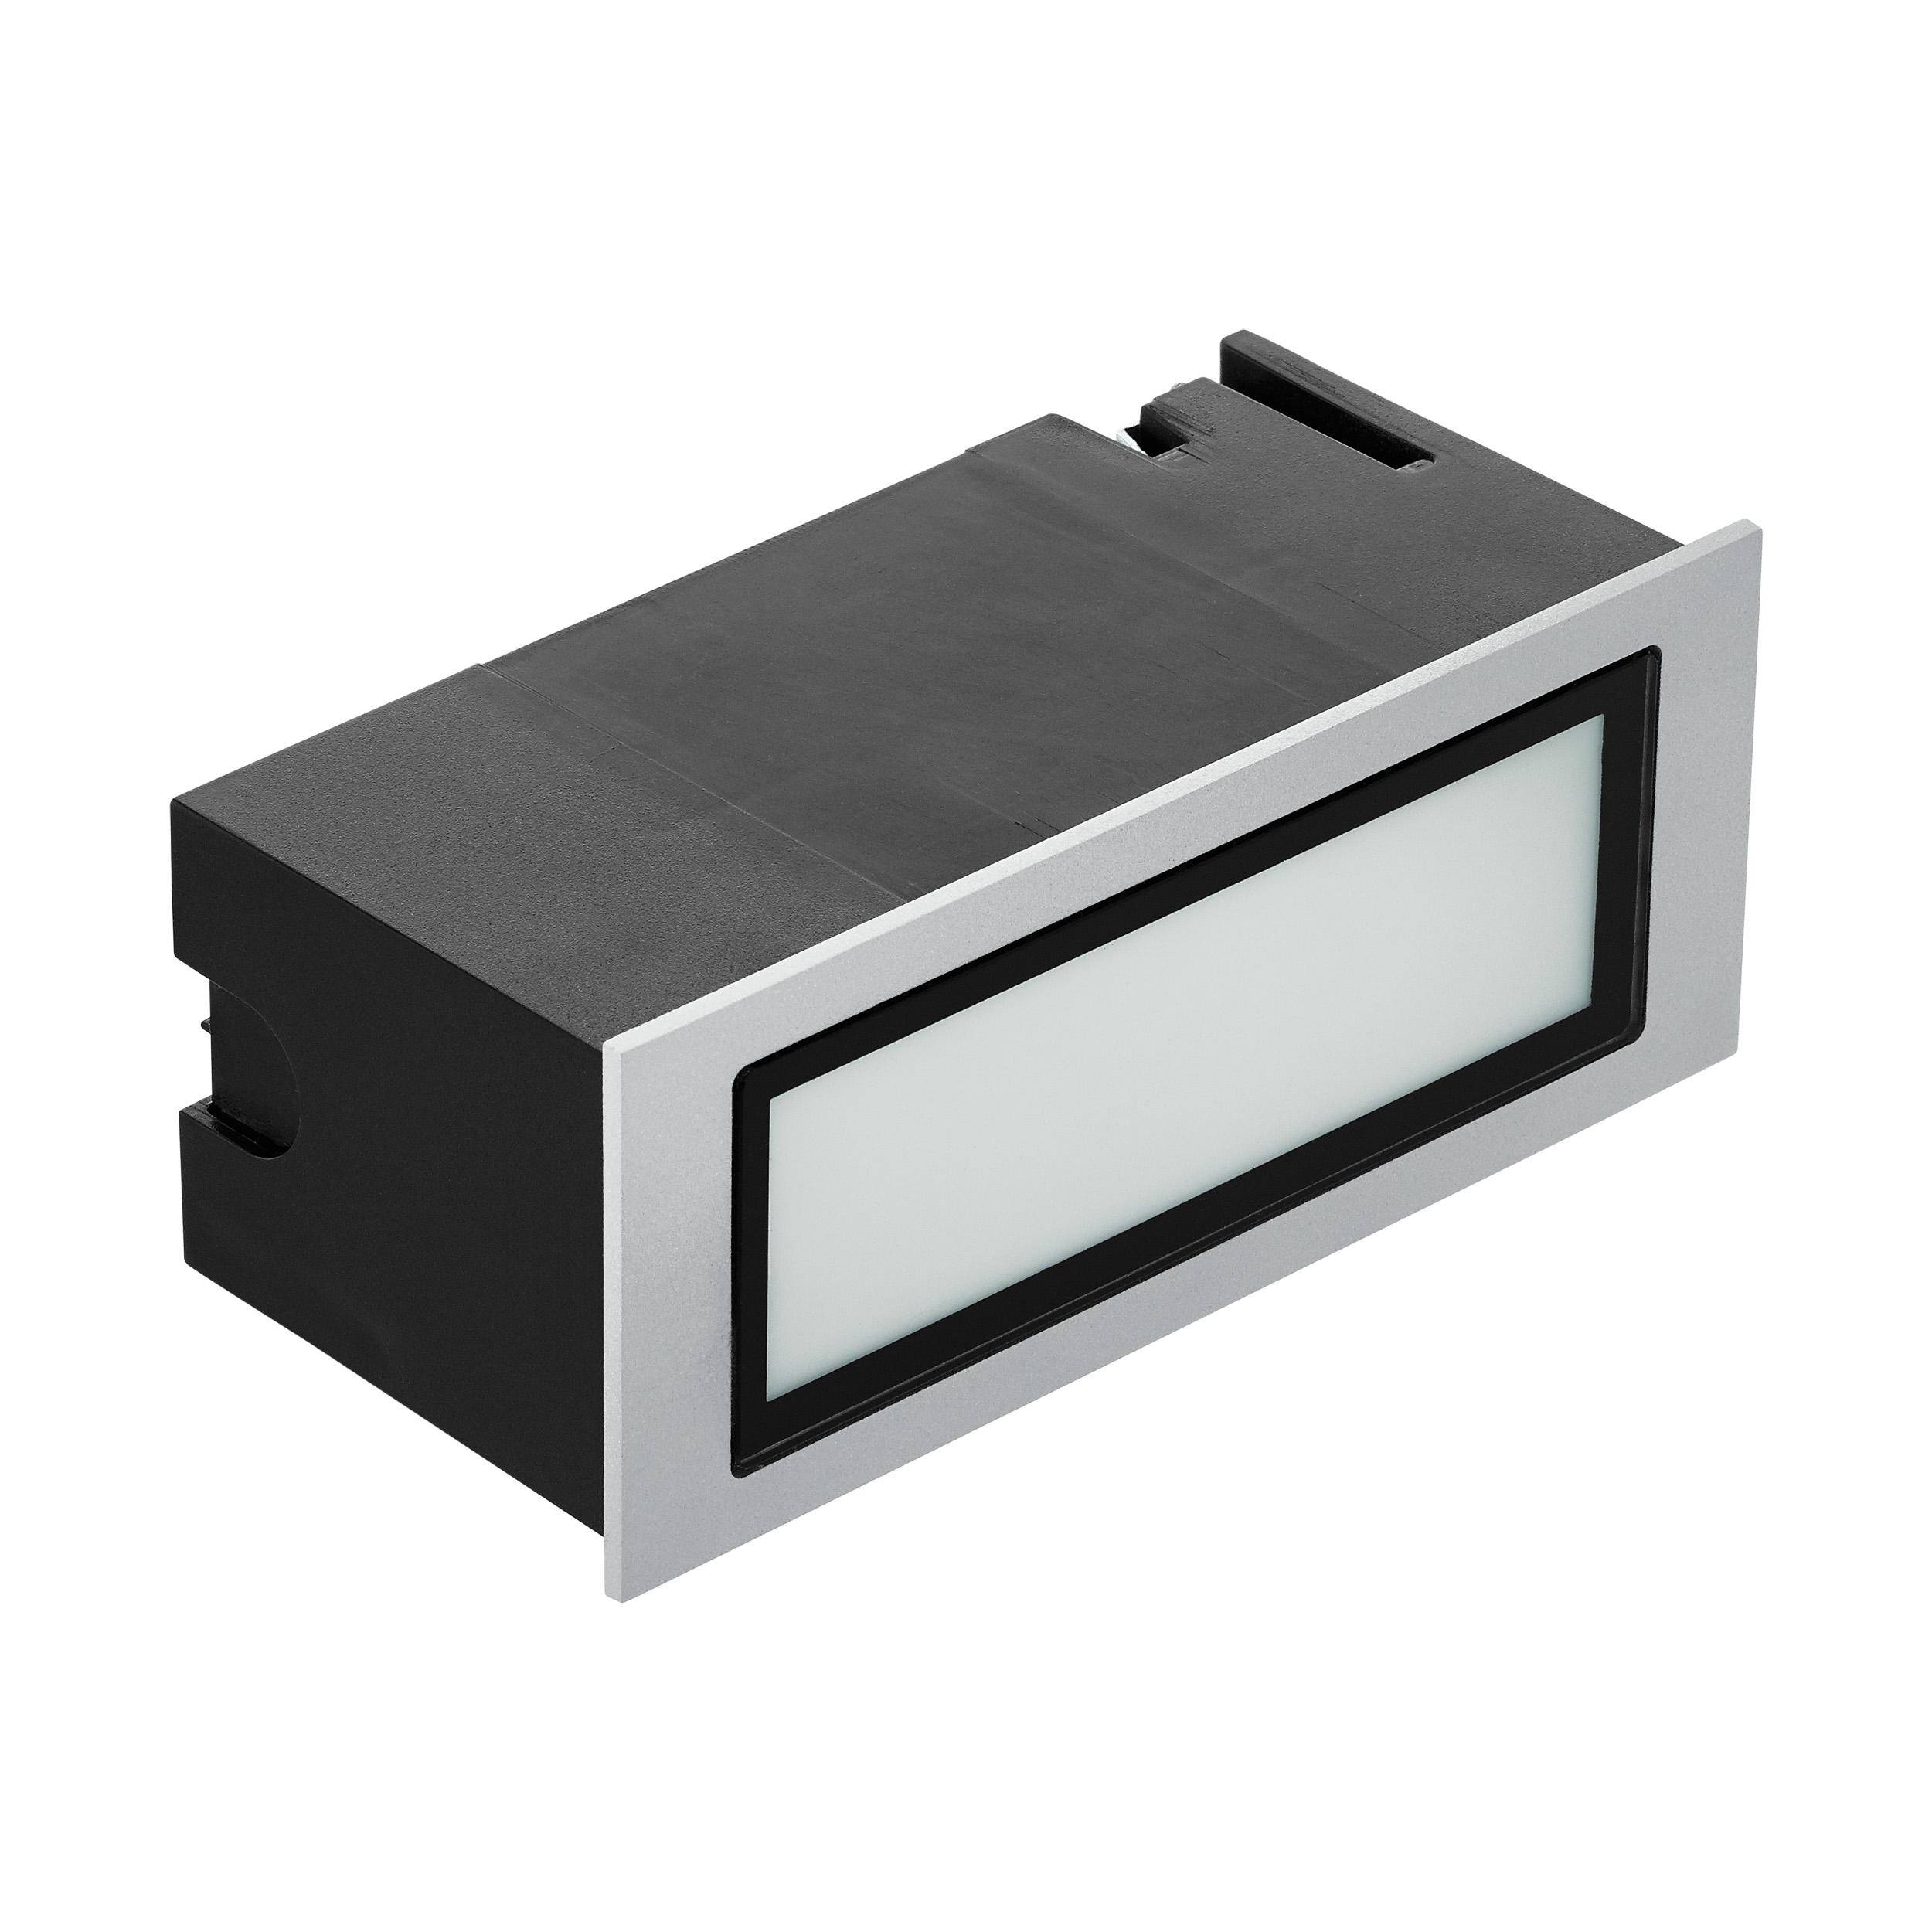 1 Stk Zimba Pro 4W 3000K silbergrau IP65 LI66269---